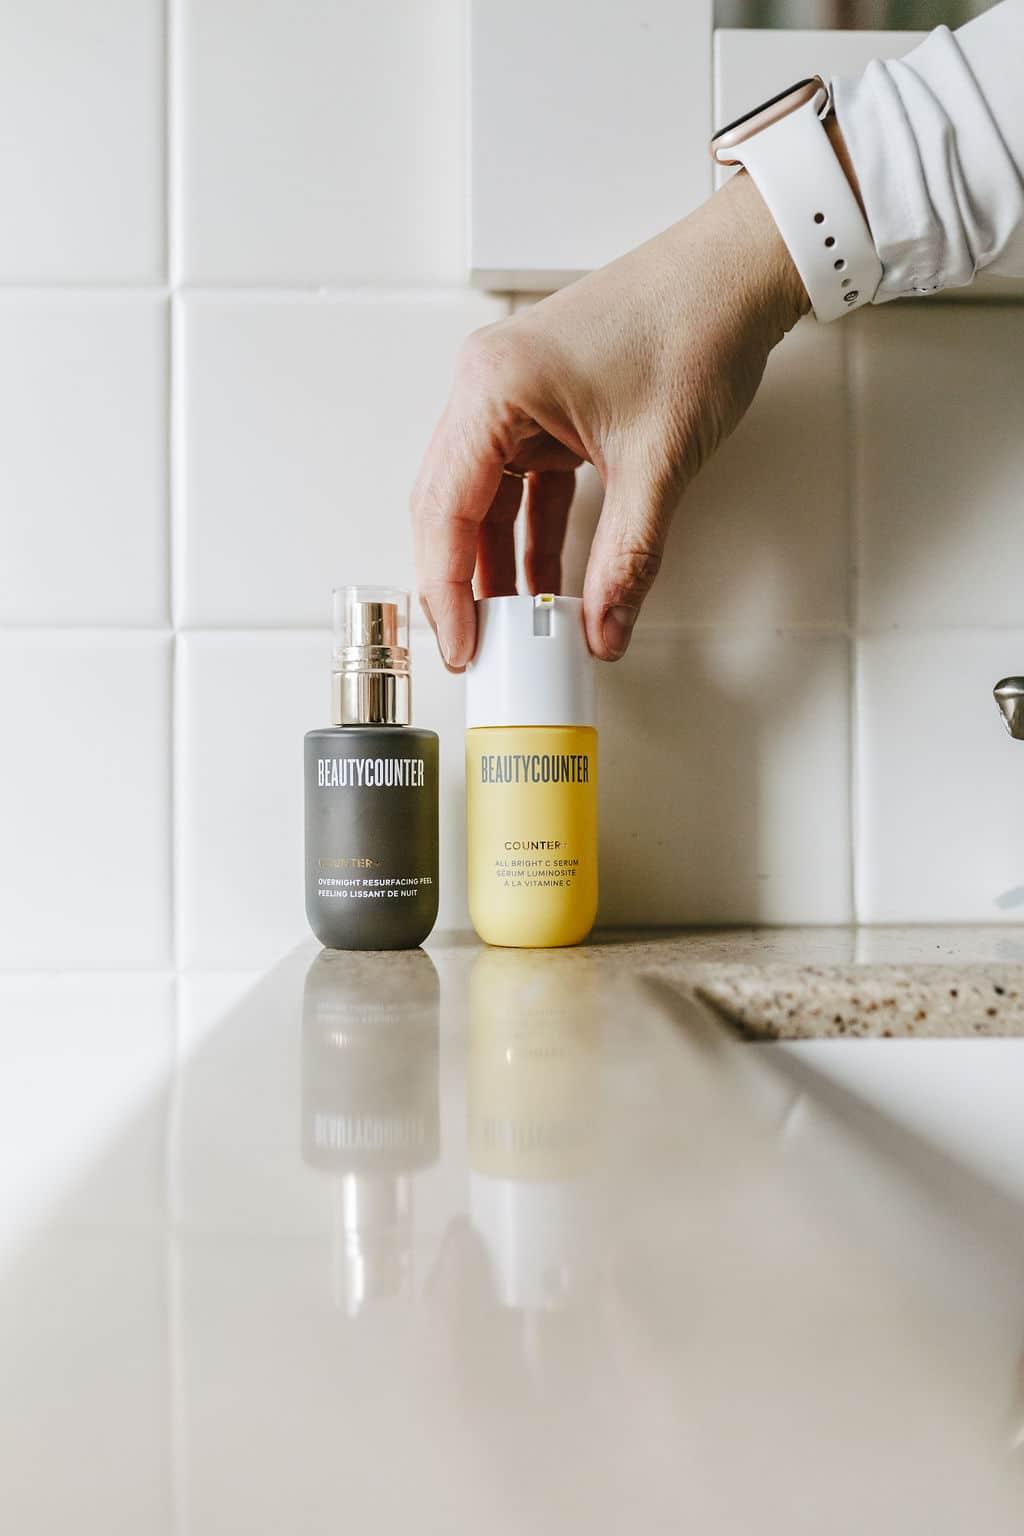 Overnight Resurfacing Peel & All Bright C Serum on bathroom counter